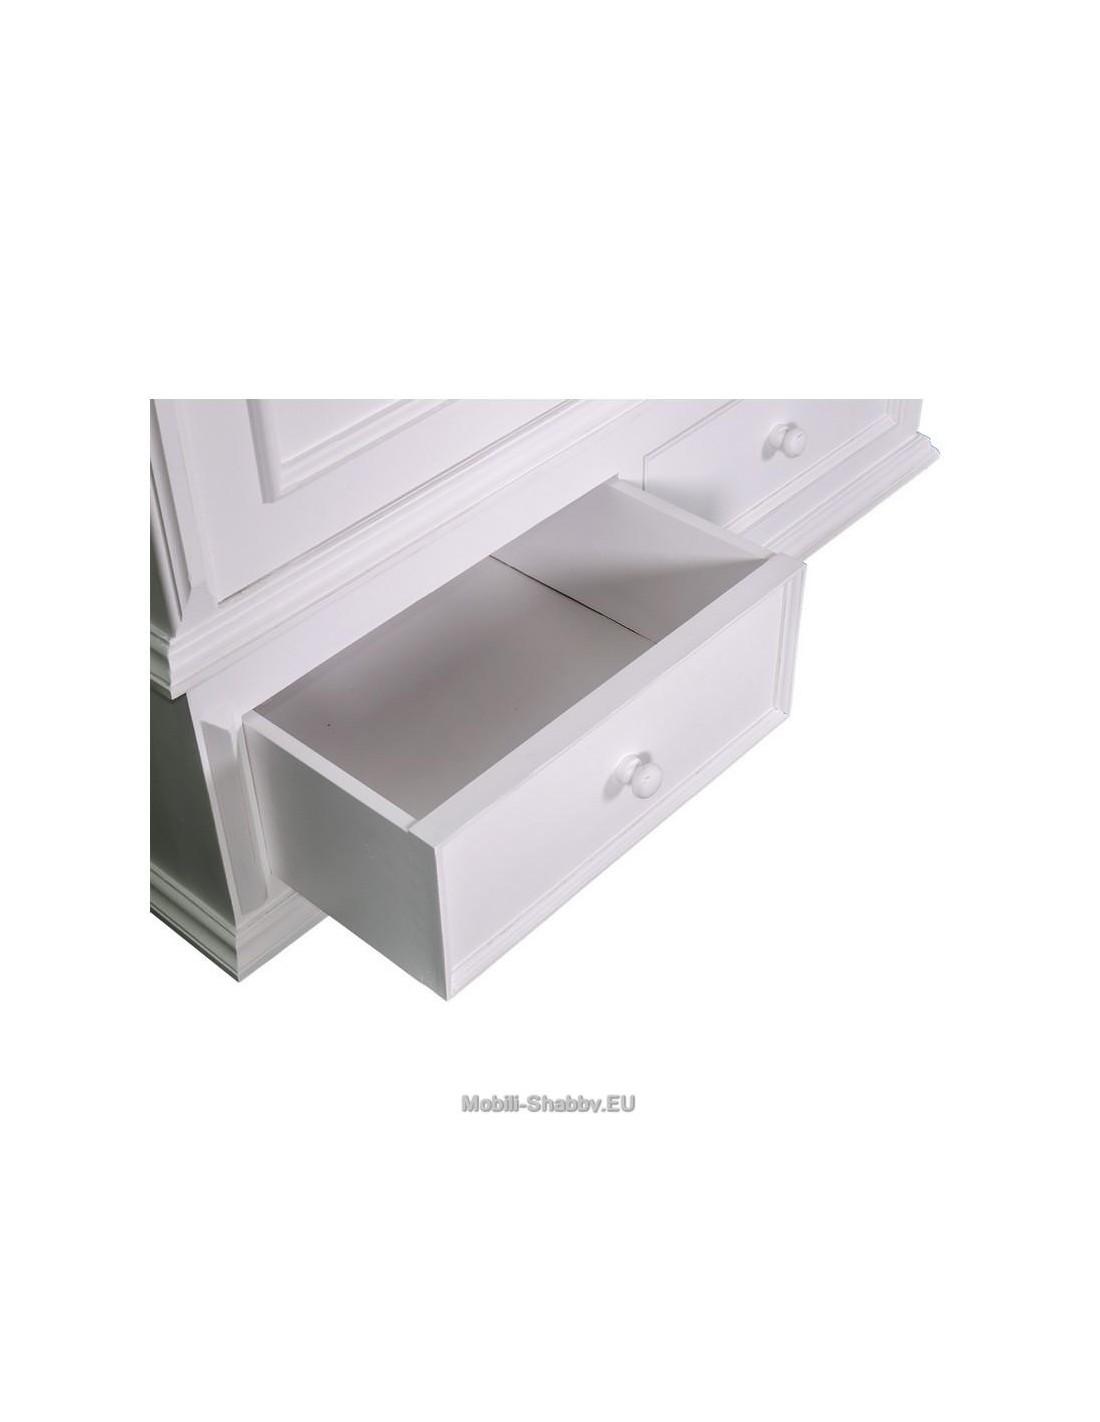 armadio shabby chic due ante e cassetti ms105 mobili shabby eu by orissa. Black Bedroom Furniture Sets. Home Design Ideas